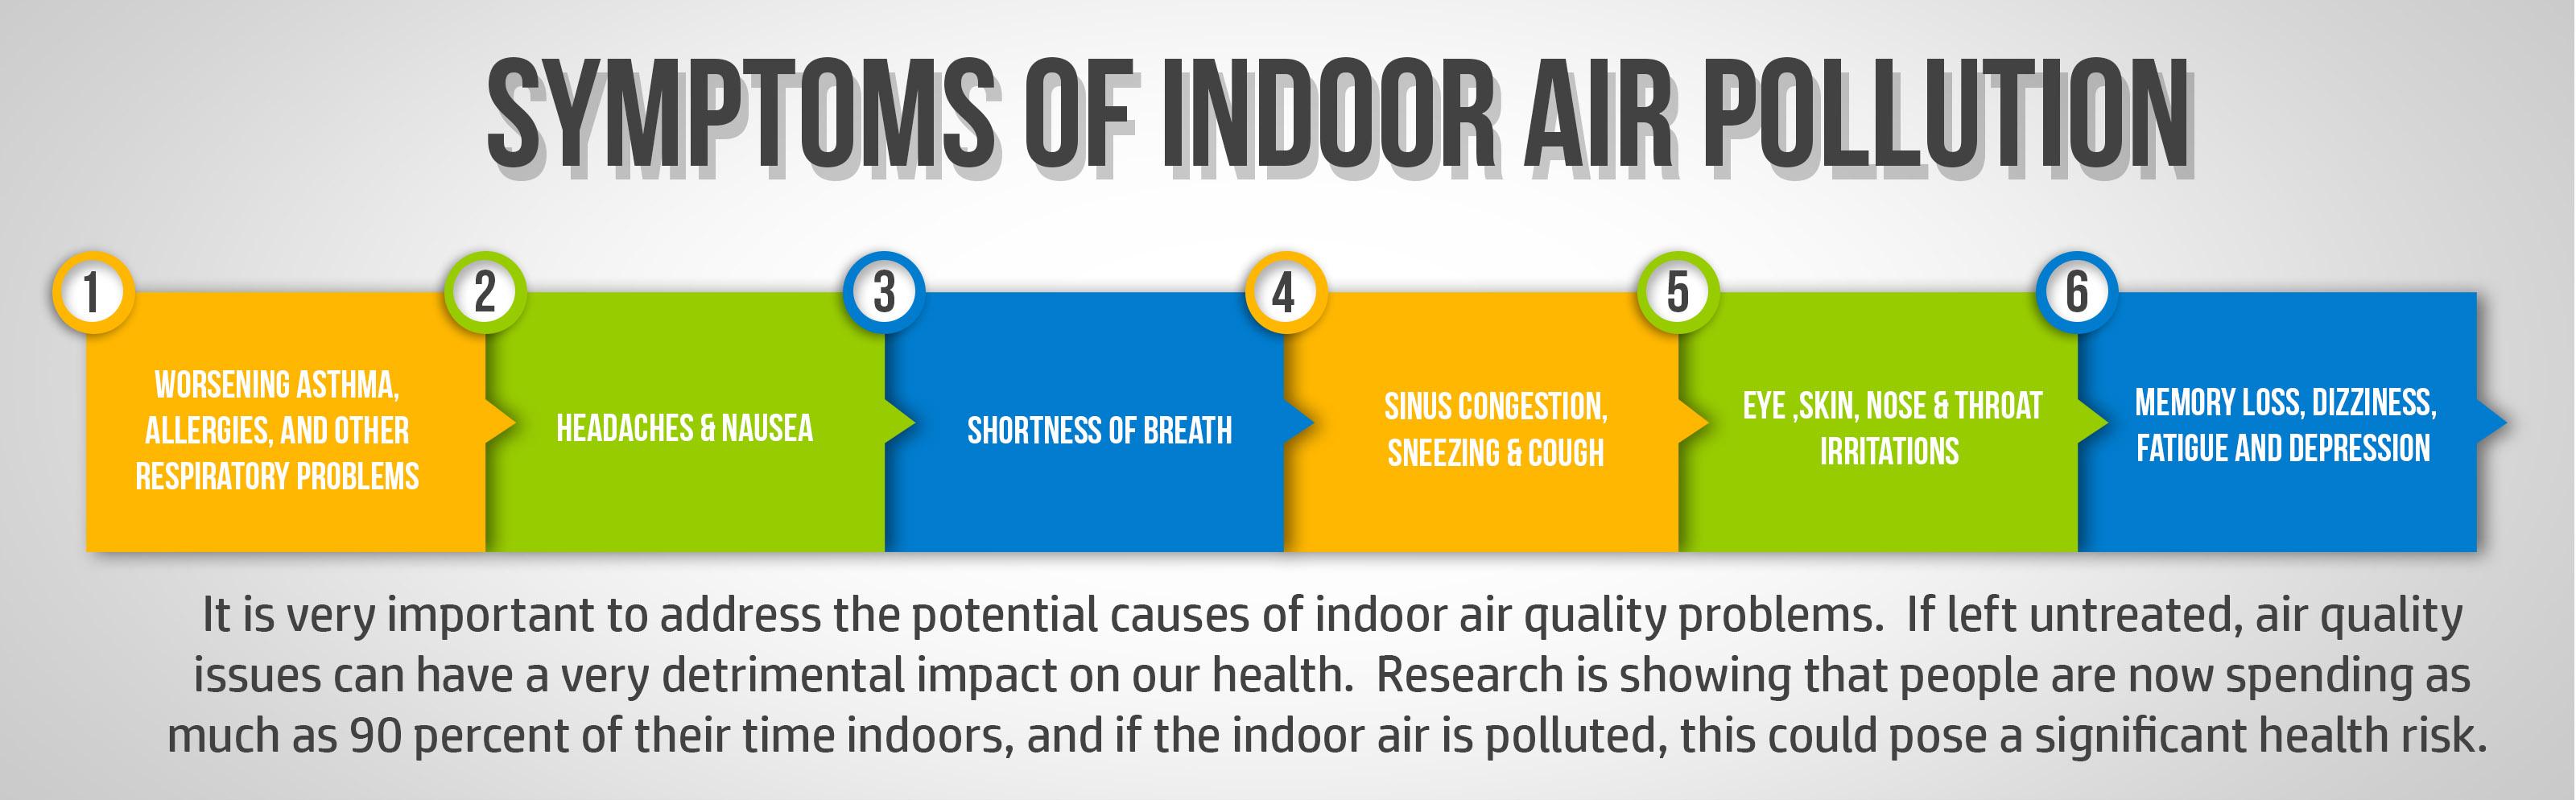 symptoms of indoor air pollution